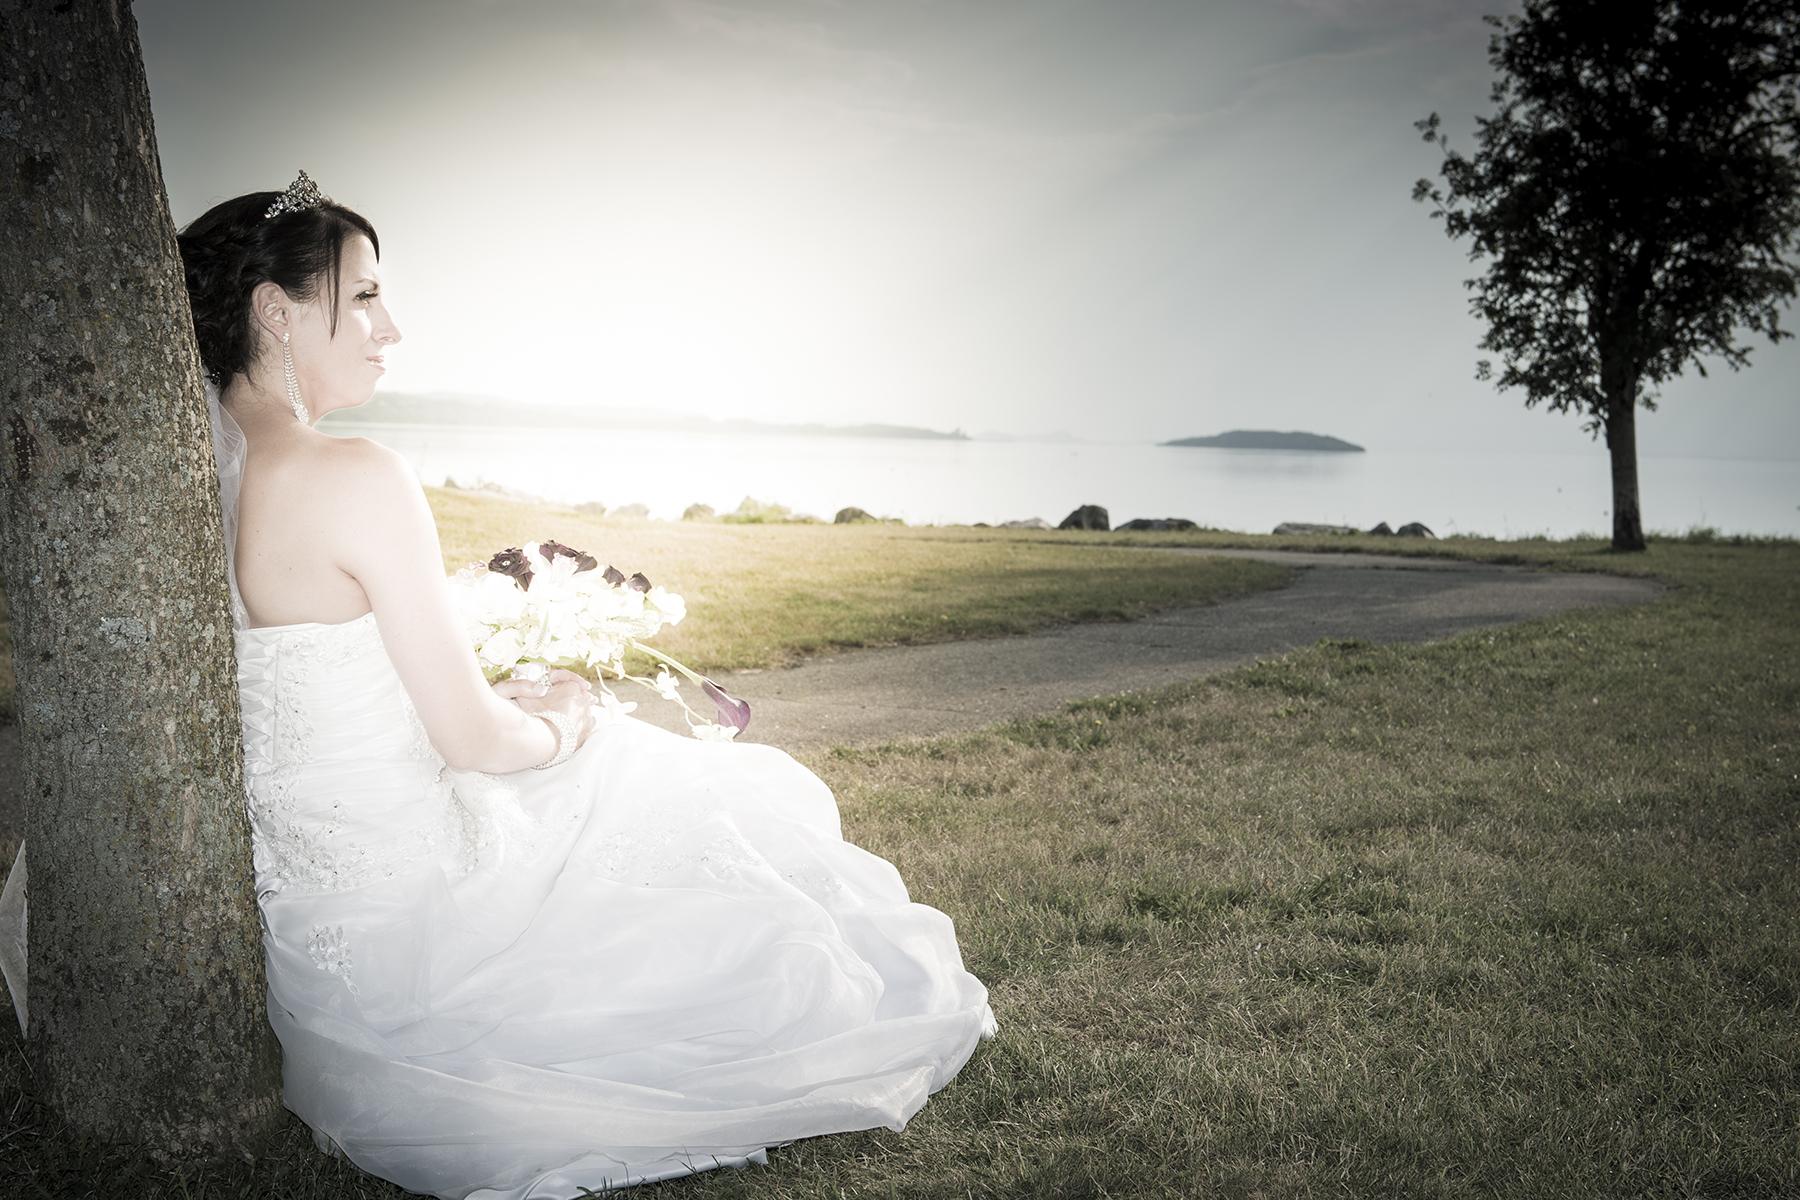 FolioPhoto-Mariage-Couple-04-ART.JPG